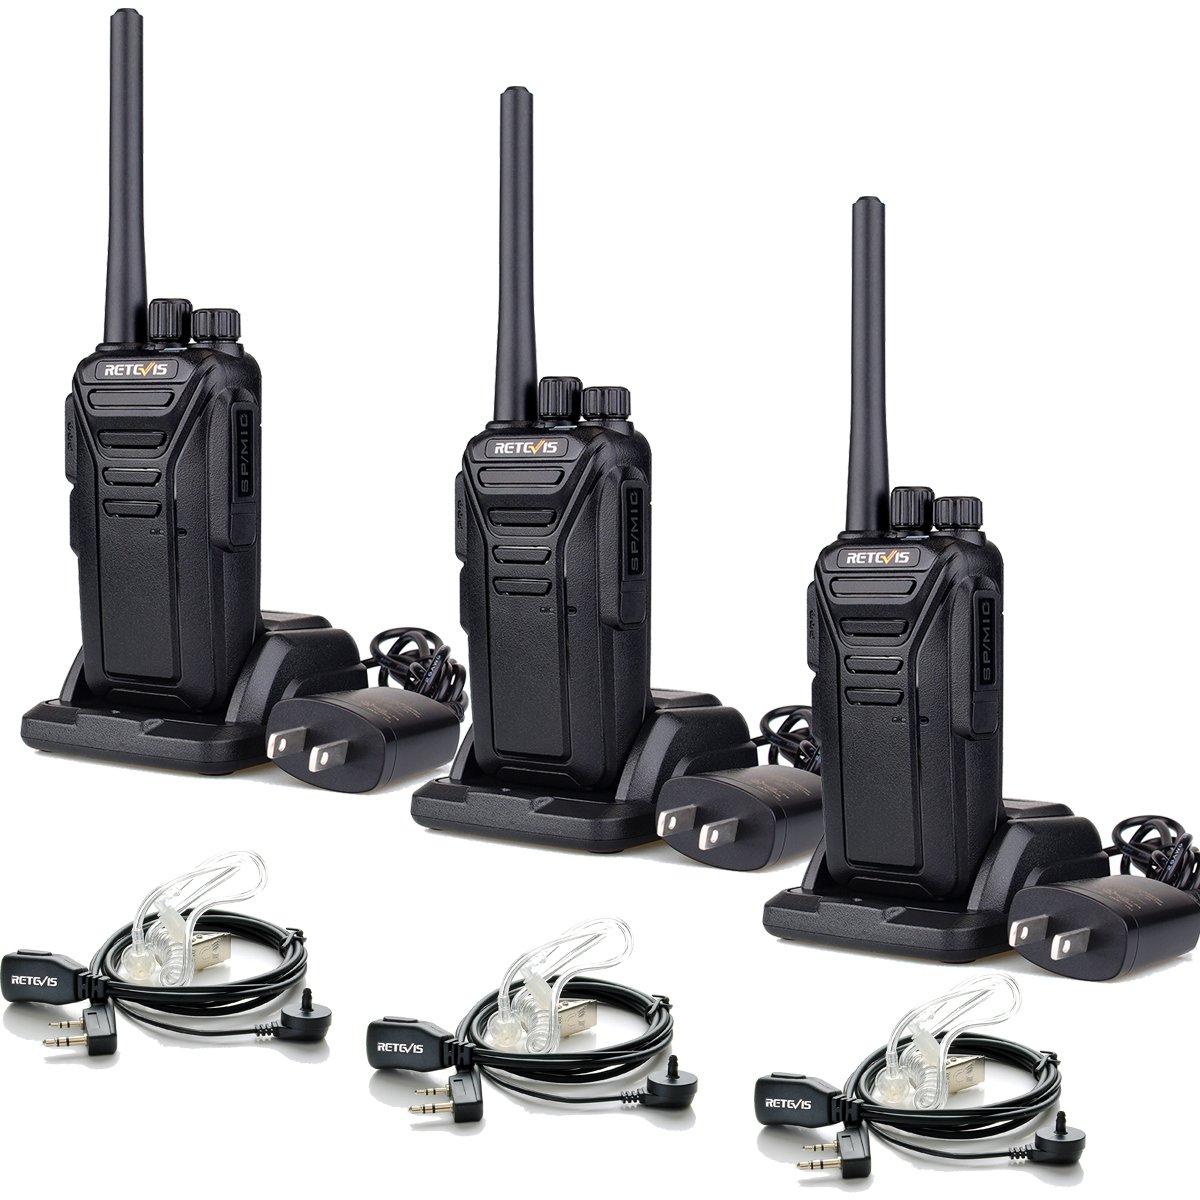 Retevis RT27 Walkie Talkies License-Free 2 Way Radios with Covert Air Acoustic Earpiece (3 Pack)